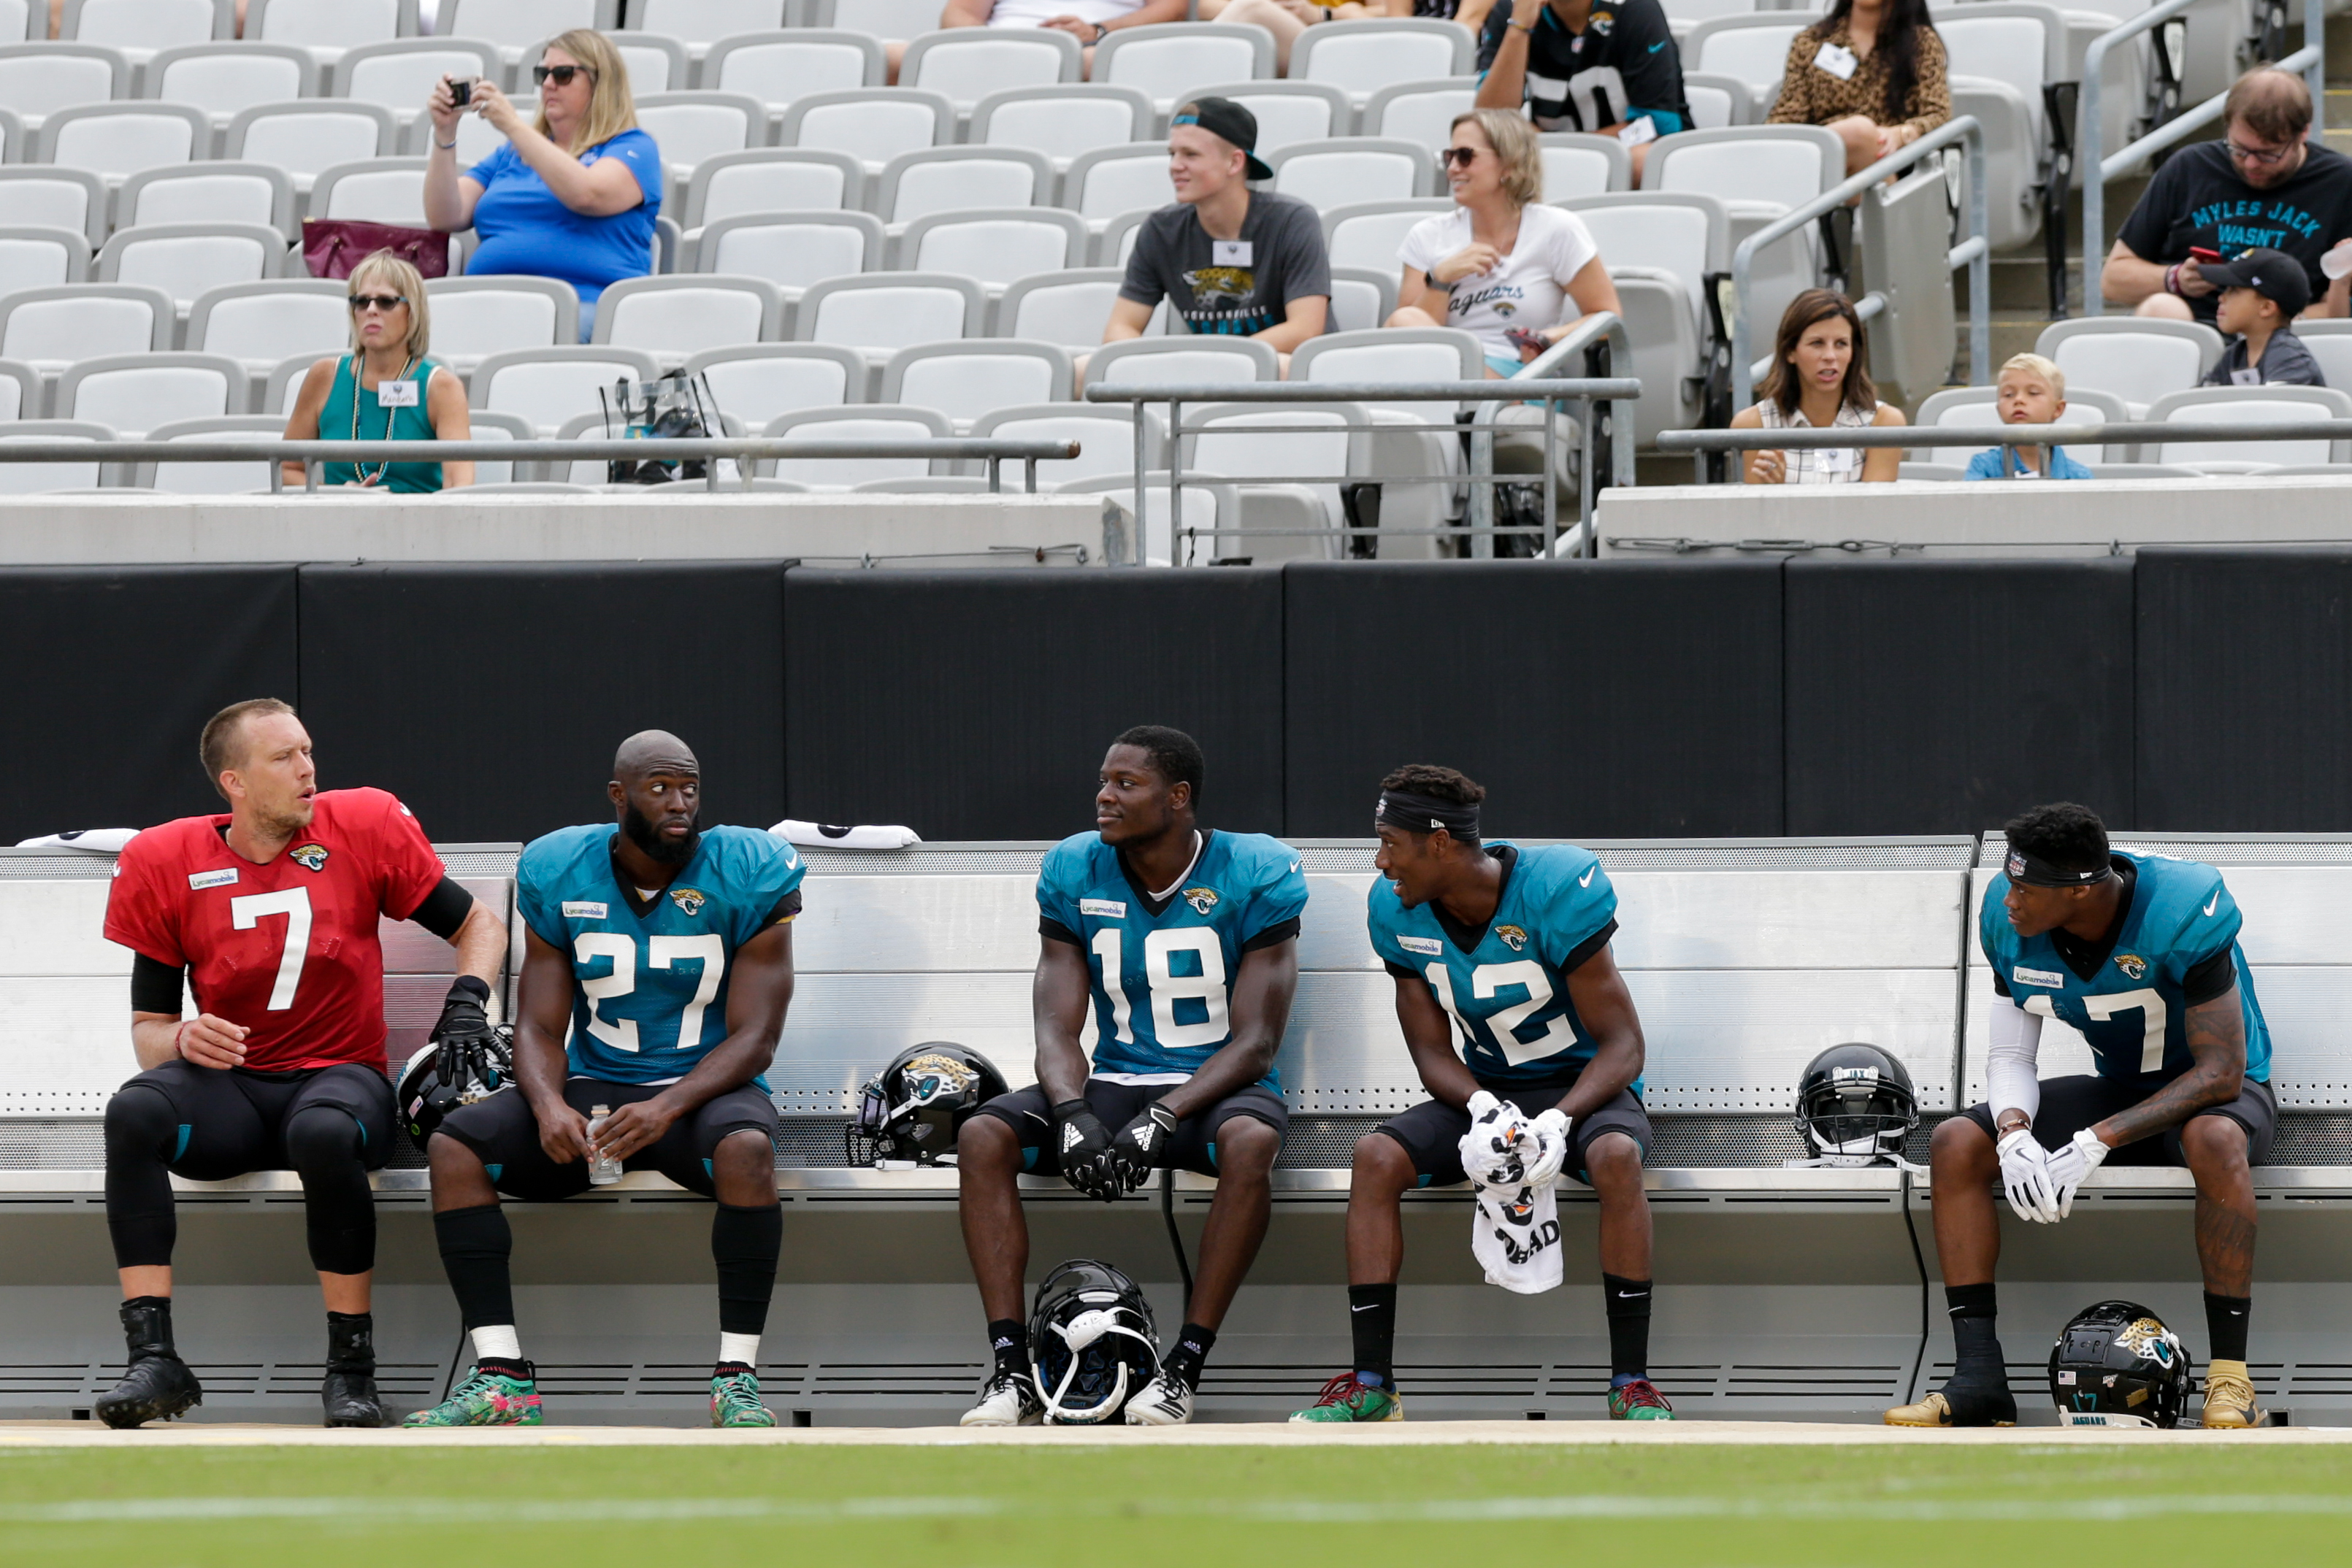 NFL: AUG 02 Jaguars Training Camp